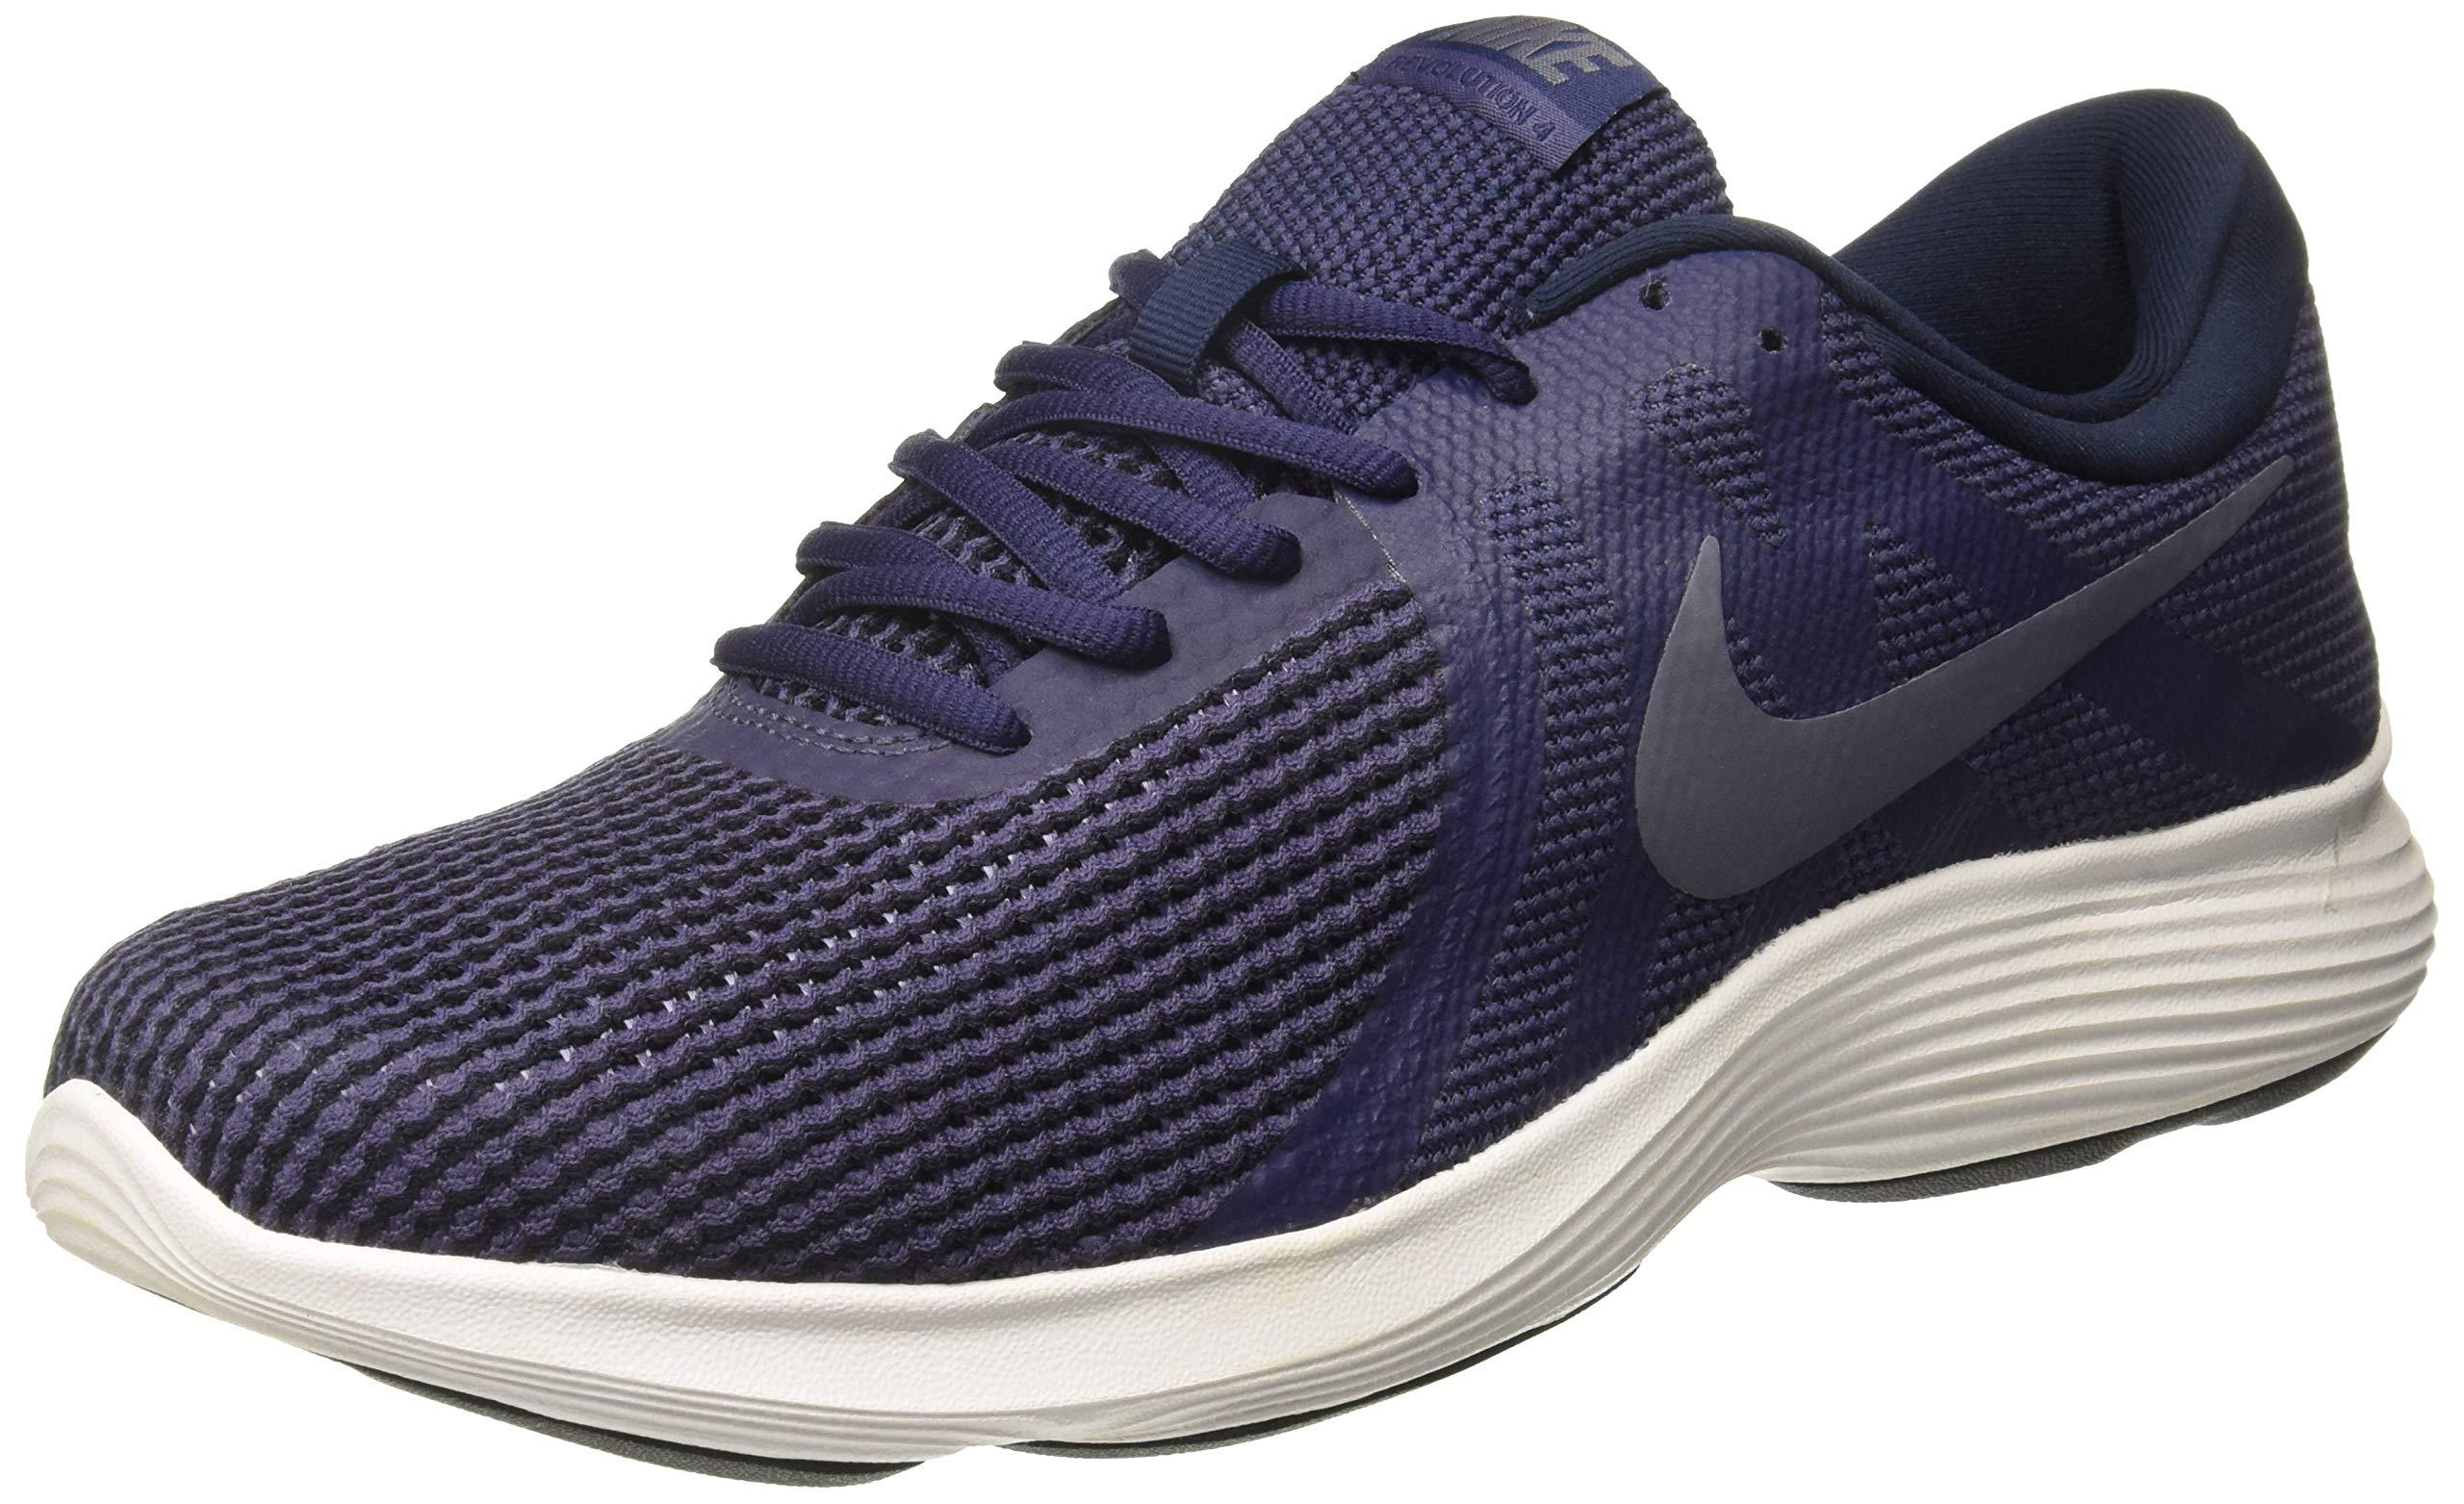 Nike Mens Revolution 4 NTRL Indigo LT CRBN Obsidian Size 12 by Nike